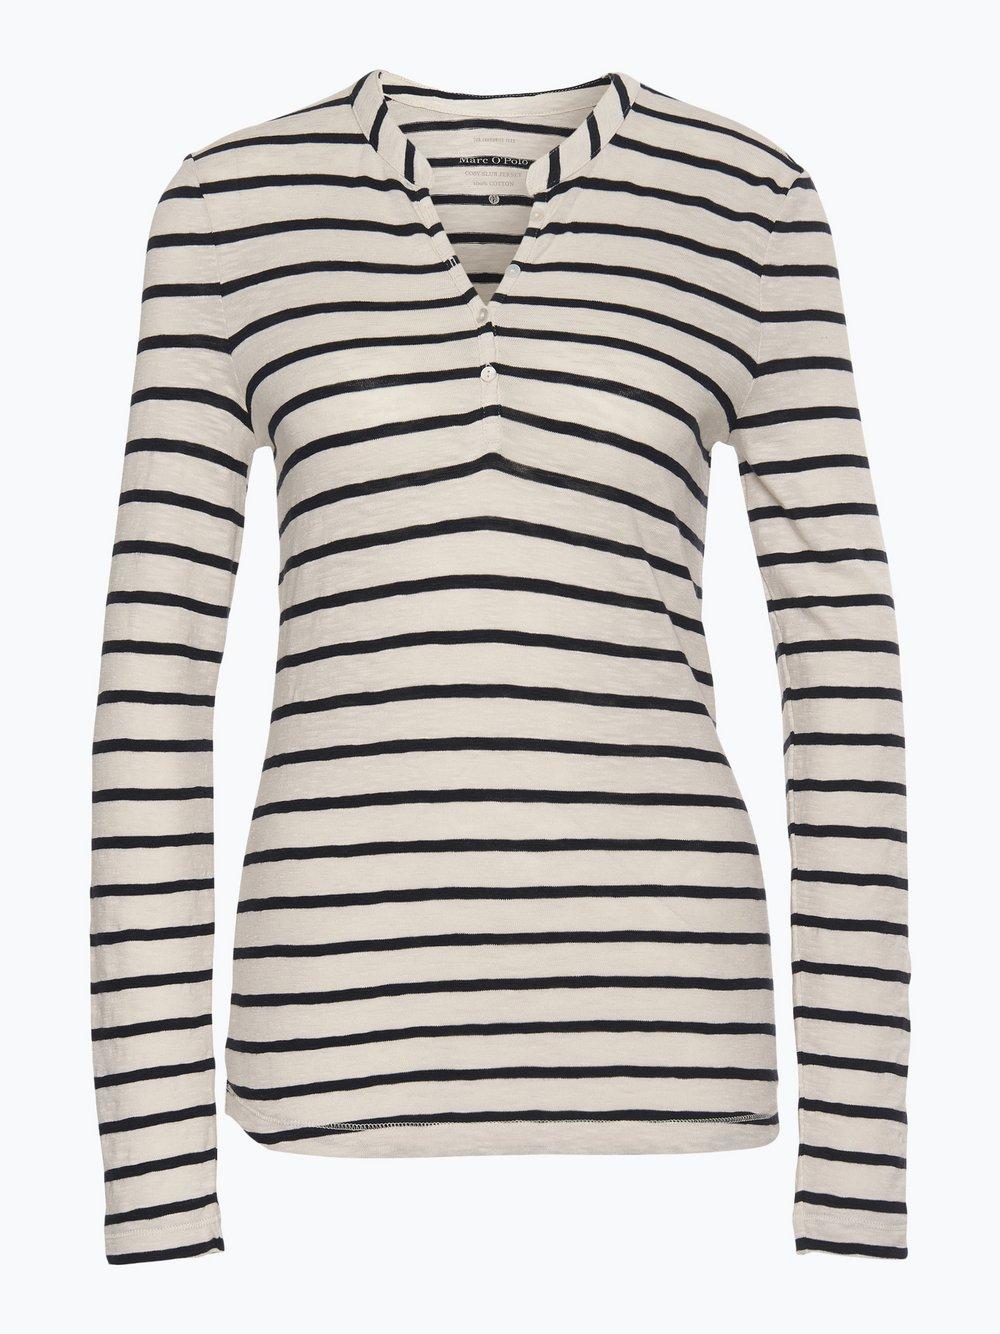 711c4128829265 Marc O'Polo Damen Langarmshirt online kaufen | VANGRAAF.COM